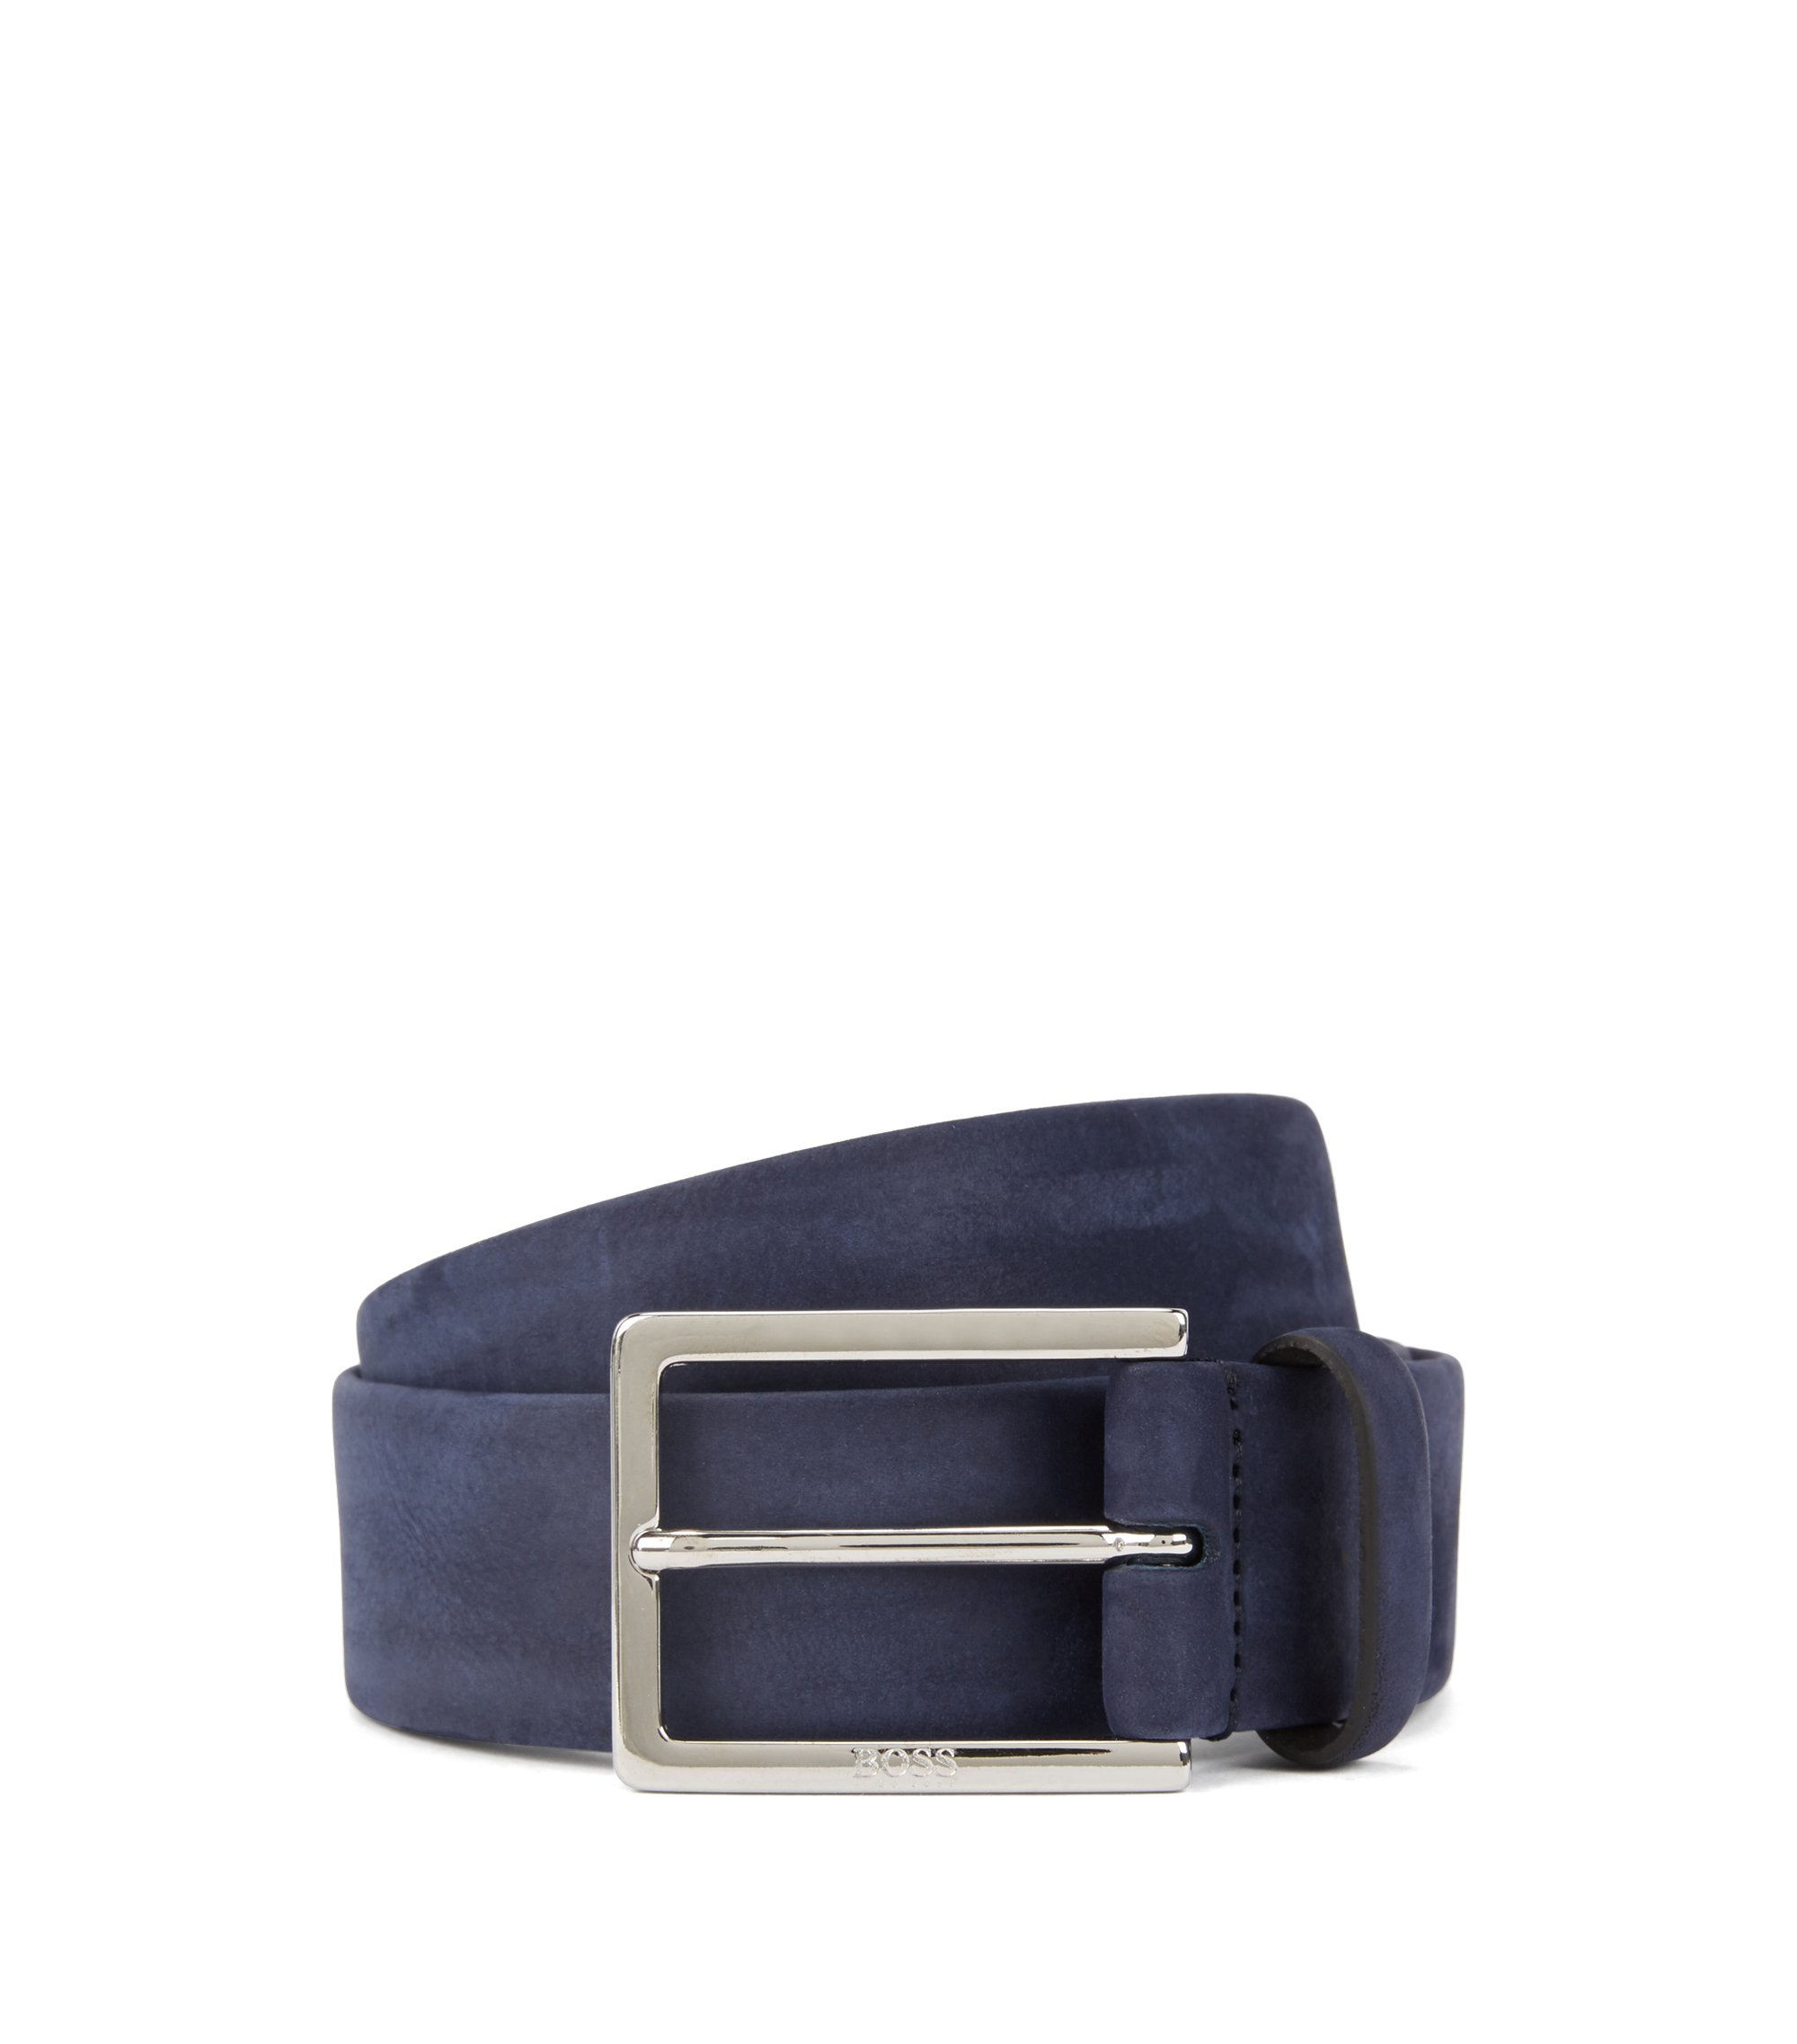 Nubuck leather belt with soft tubular construction, Dark Blue